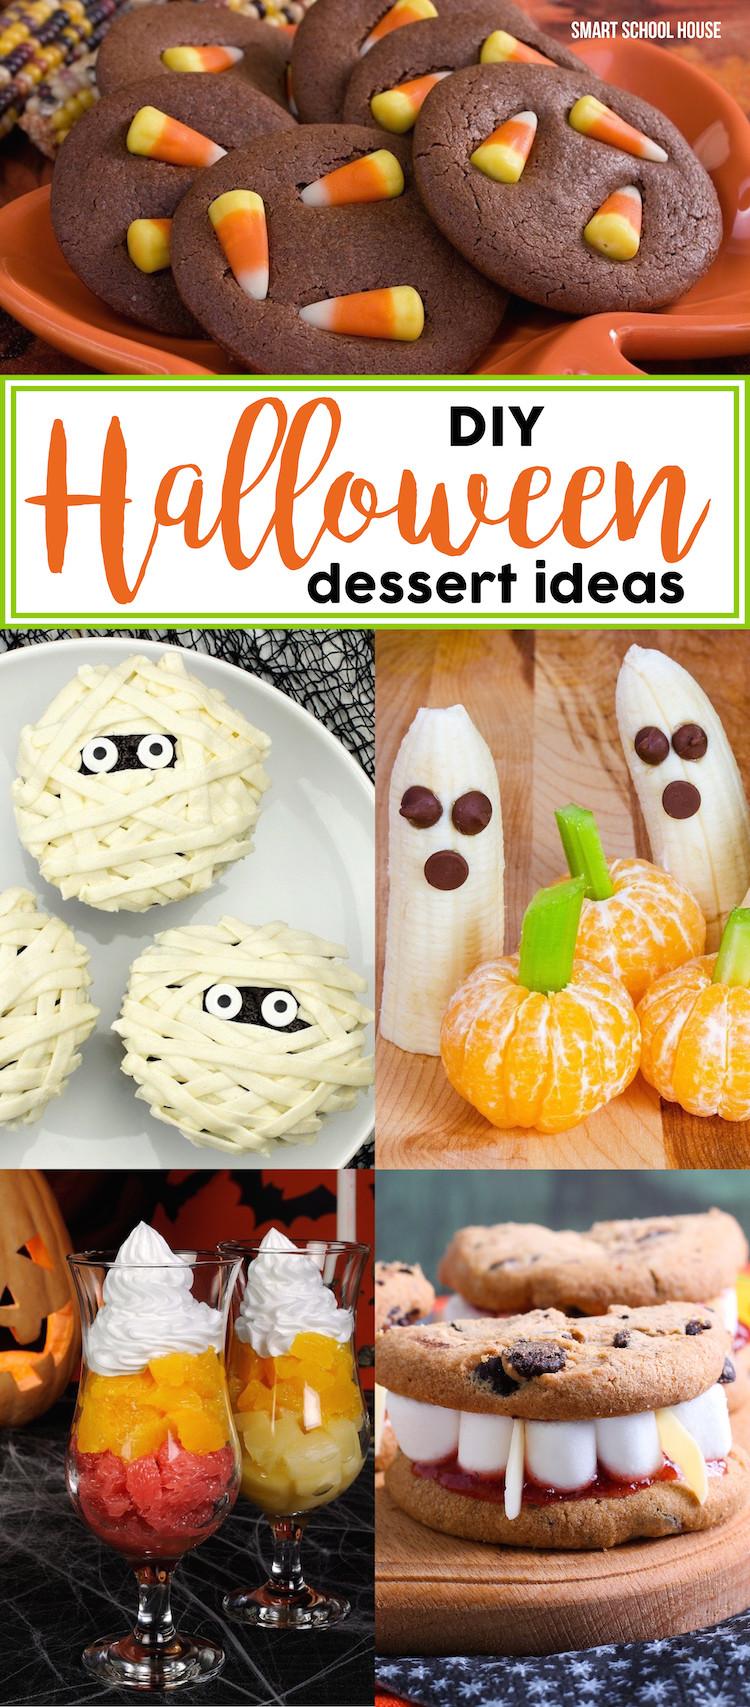 Halloween Desserts Easy  Halloween Dessert Ideas Page 5 of 22 Smart School House